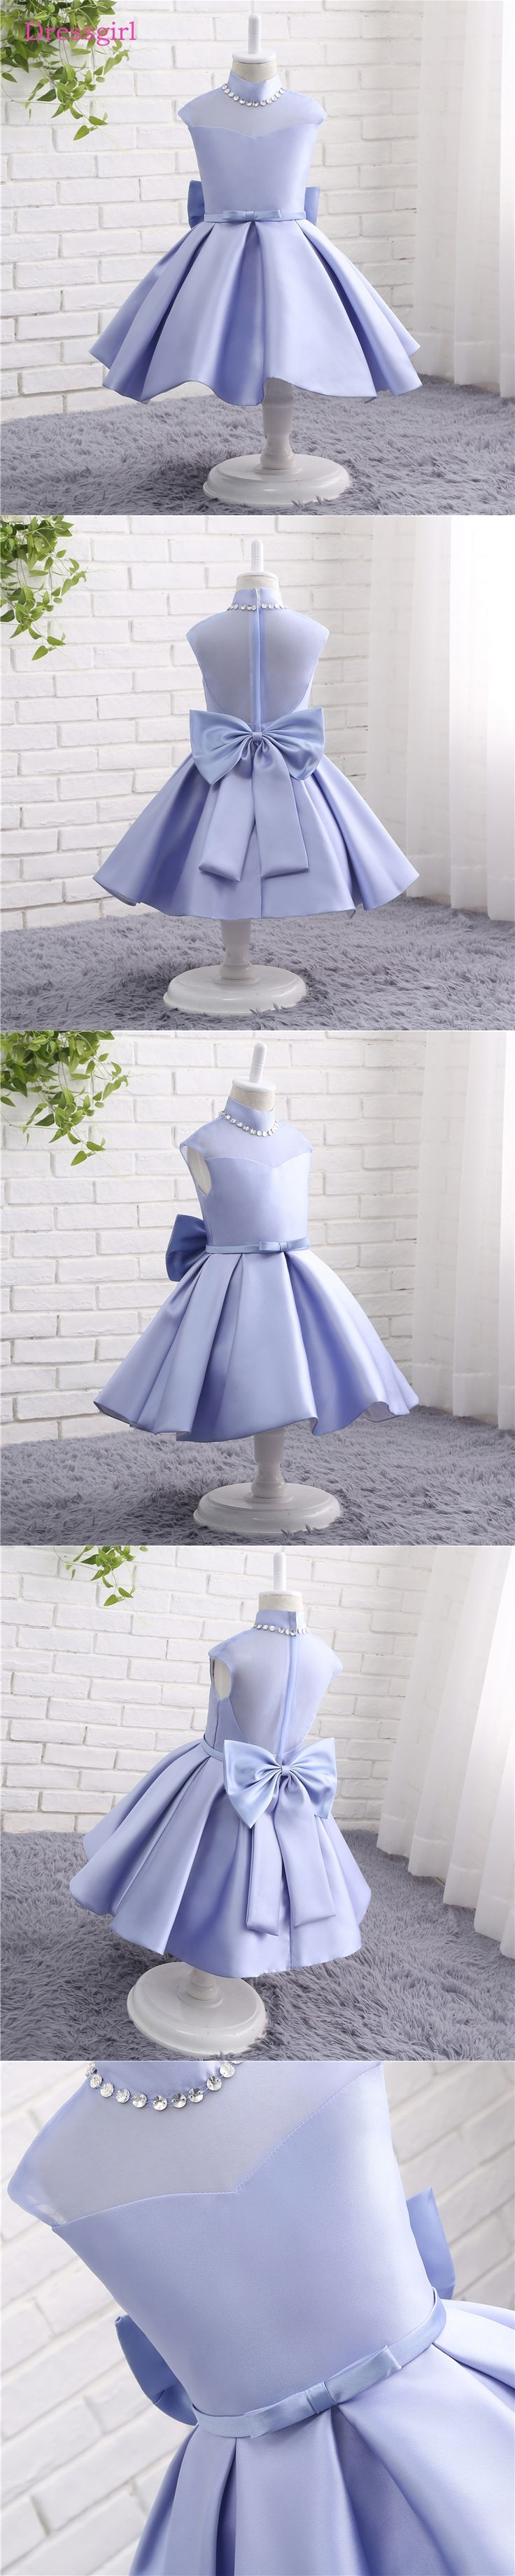 New 2018 Flower Girl Dresses For Weddings A-line Long Sleeves Satin Lace First Communion Dresses For Little Girls